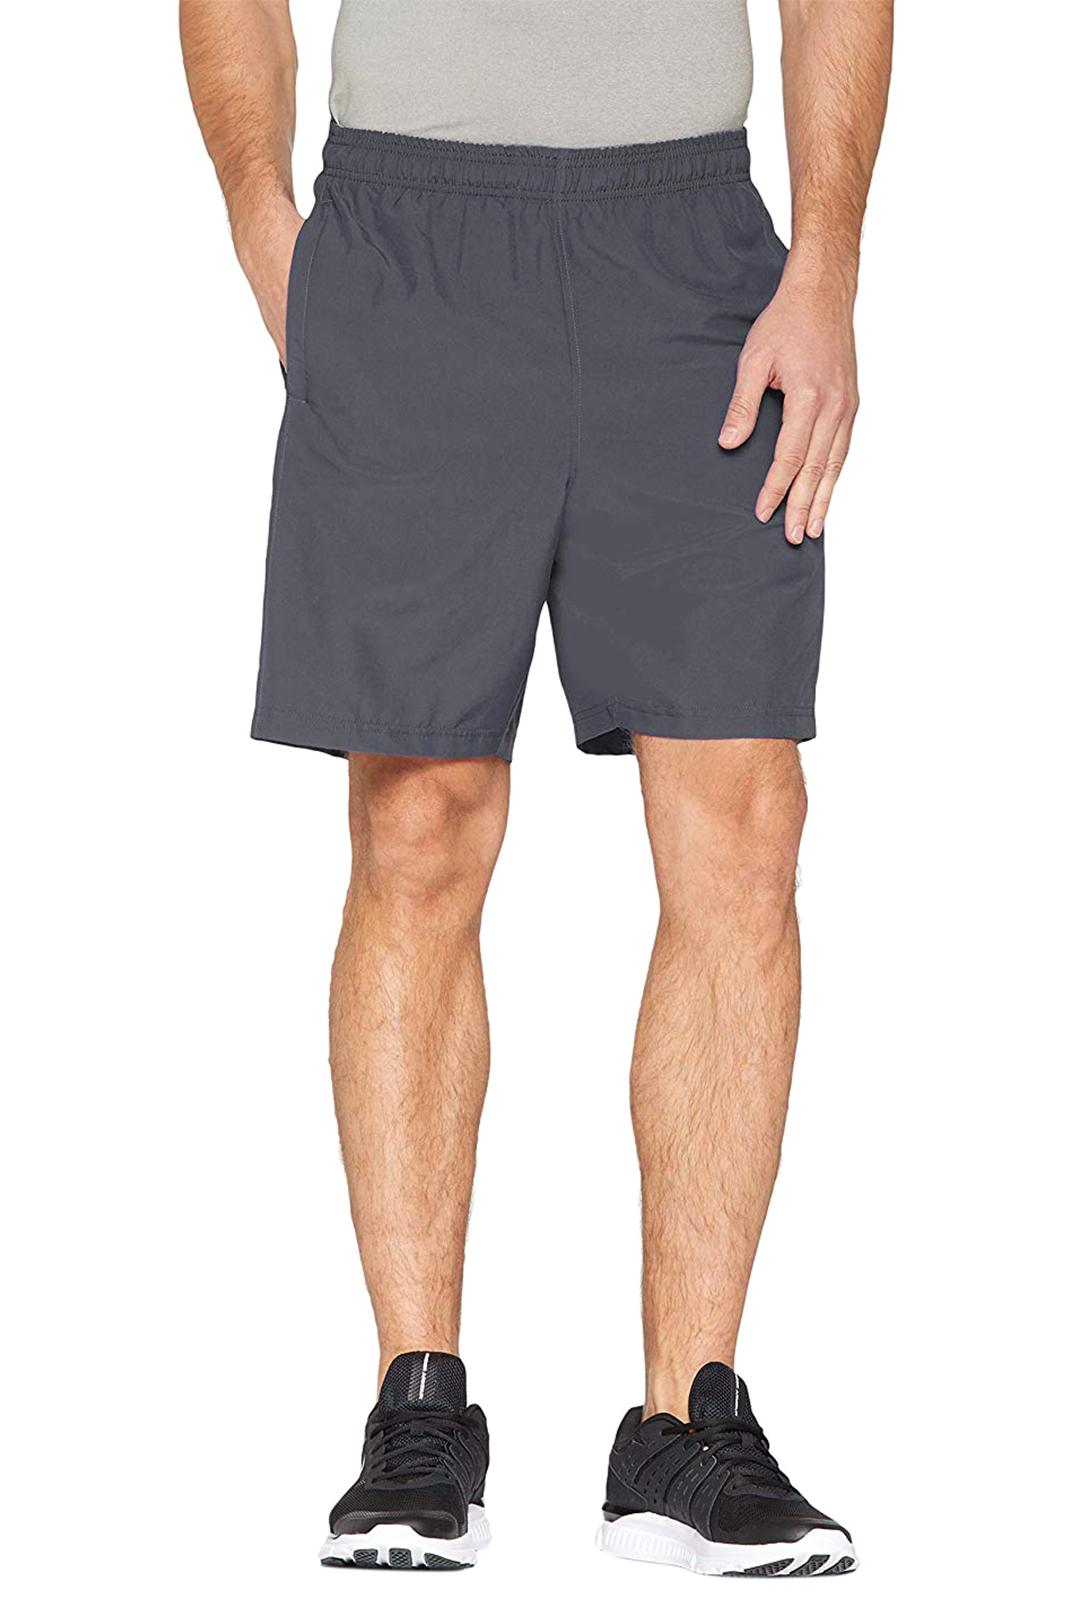 Shorts & Bermudas  Under armour 1320203-012 012 JET GRAY